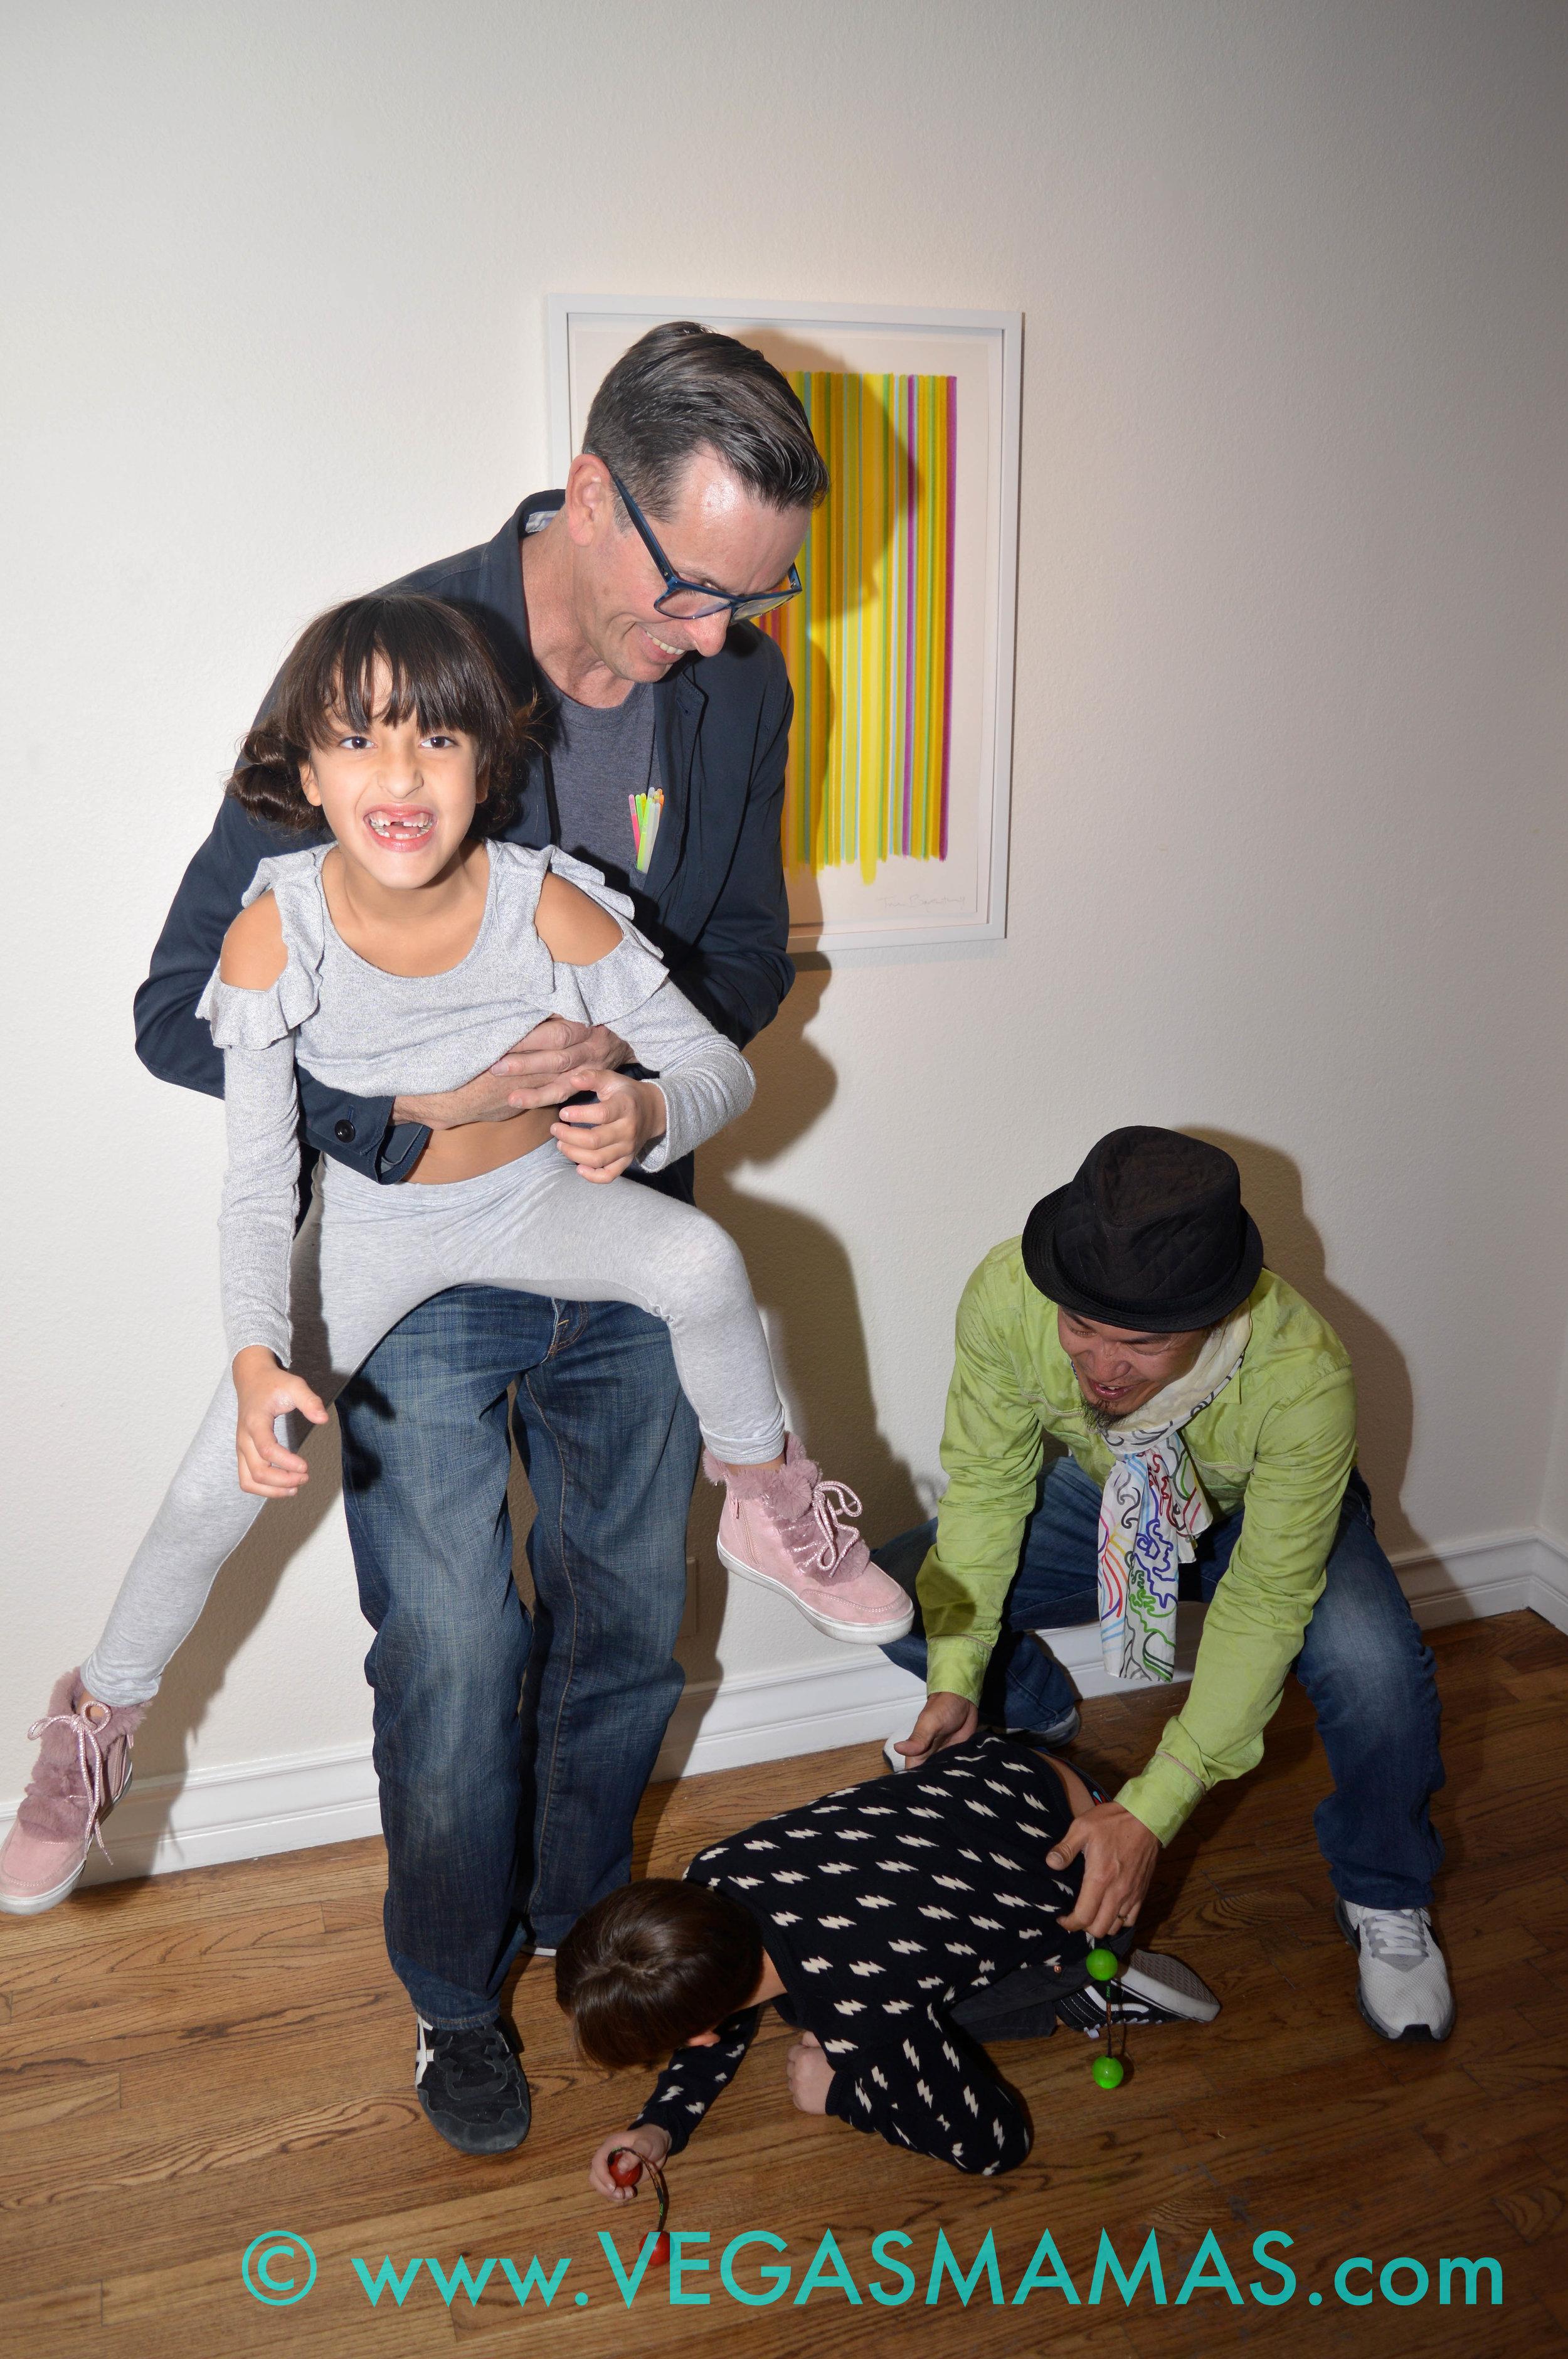 Tim Bavington with his twins Lily & Jet and Sush Machida.